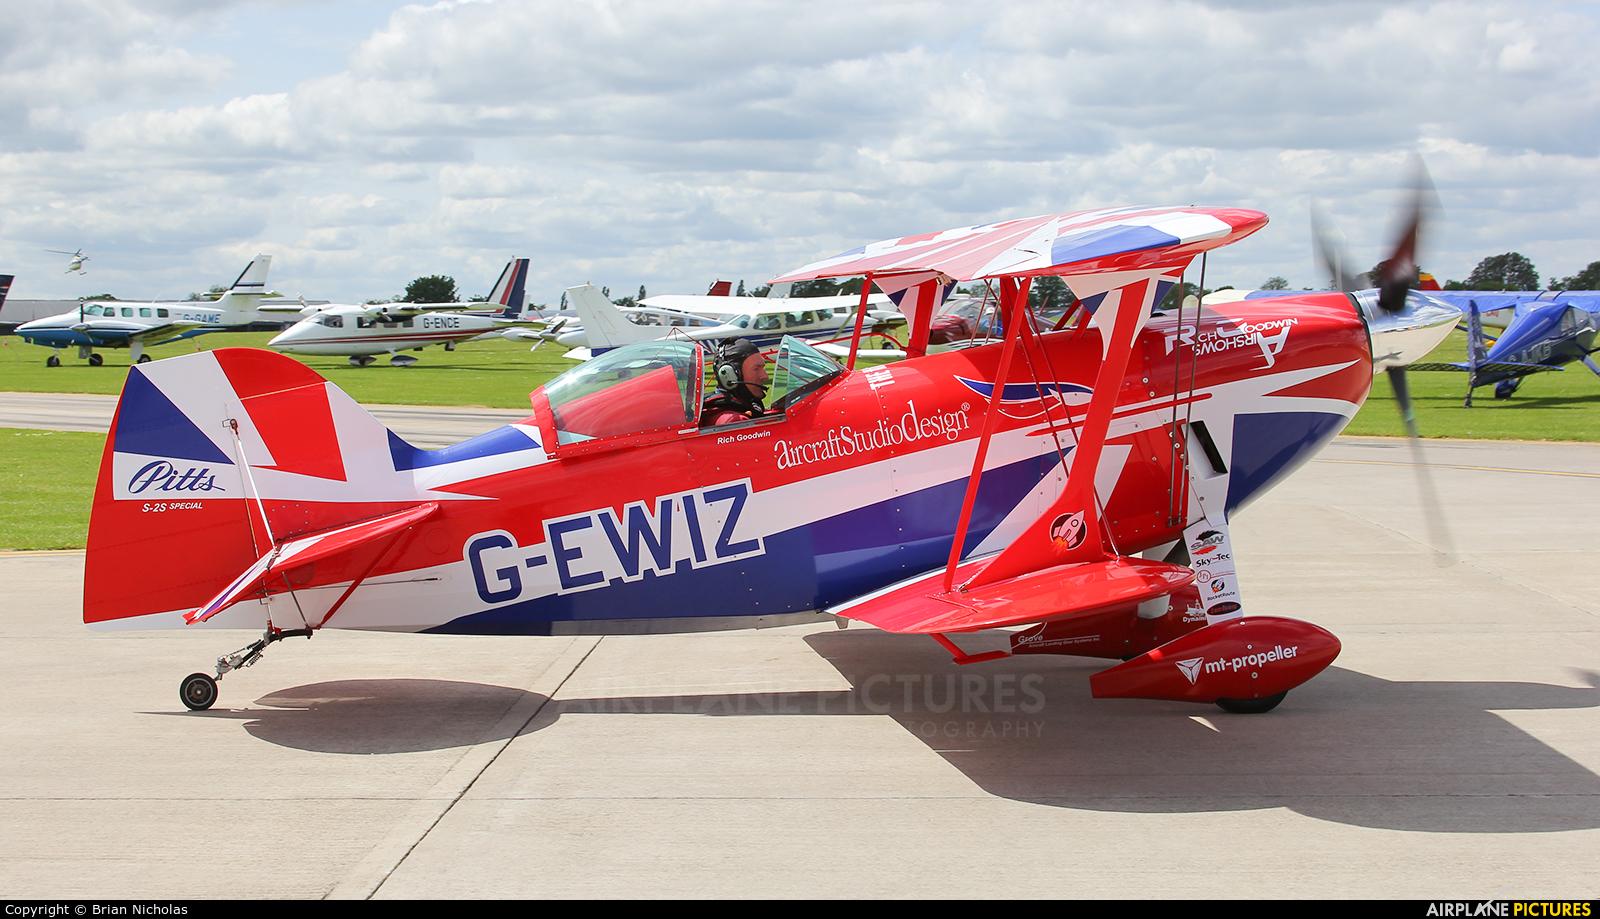 Rich Goodwin Airshows G-EWIZ aircraft at Northampton / Sywell